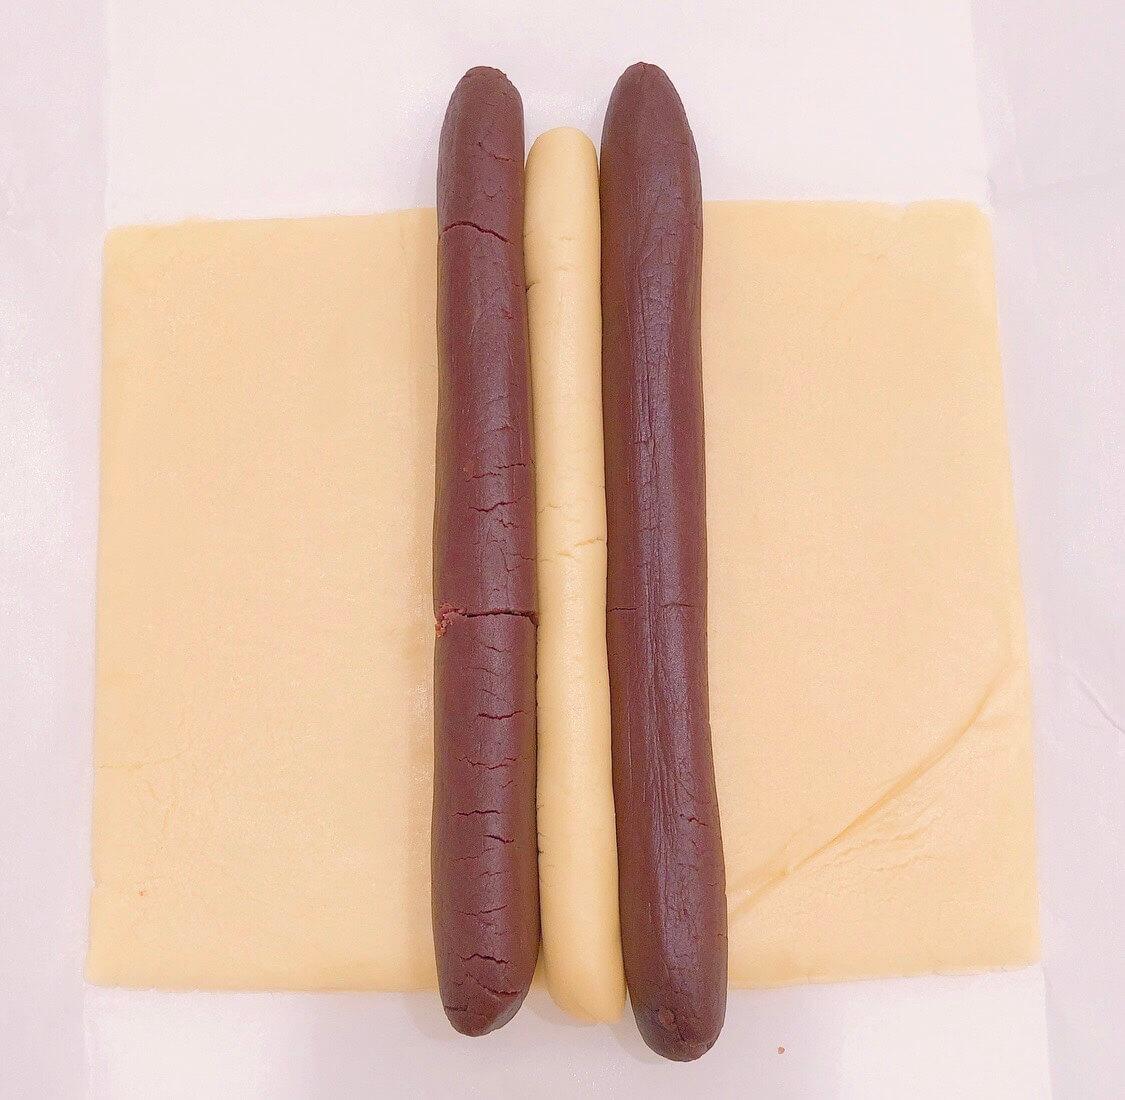 kaori レシピ ディズニー スイーツ recipe disney sweets 甜點 食譜 ミッキー Mickey 8